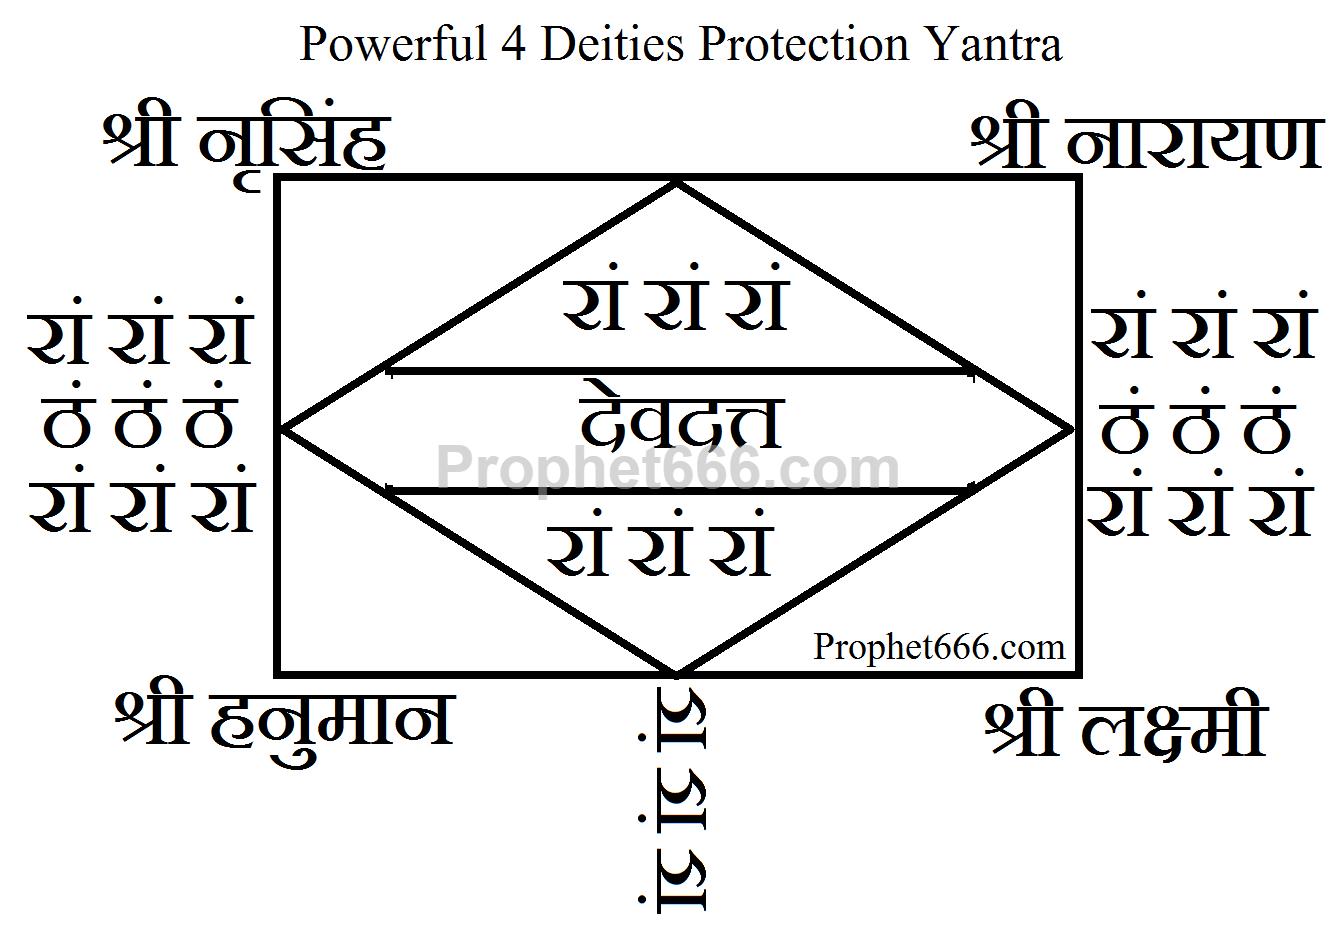 Powerful 4 Deities Protection Yantra